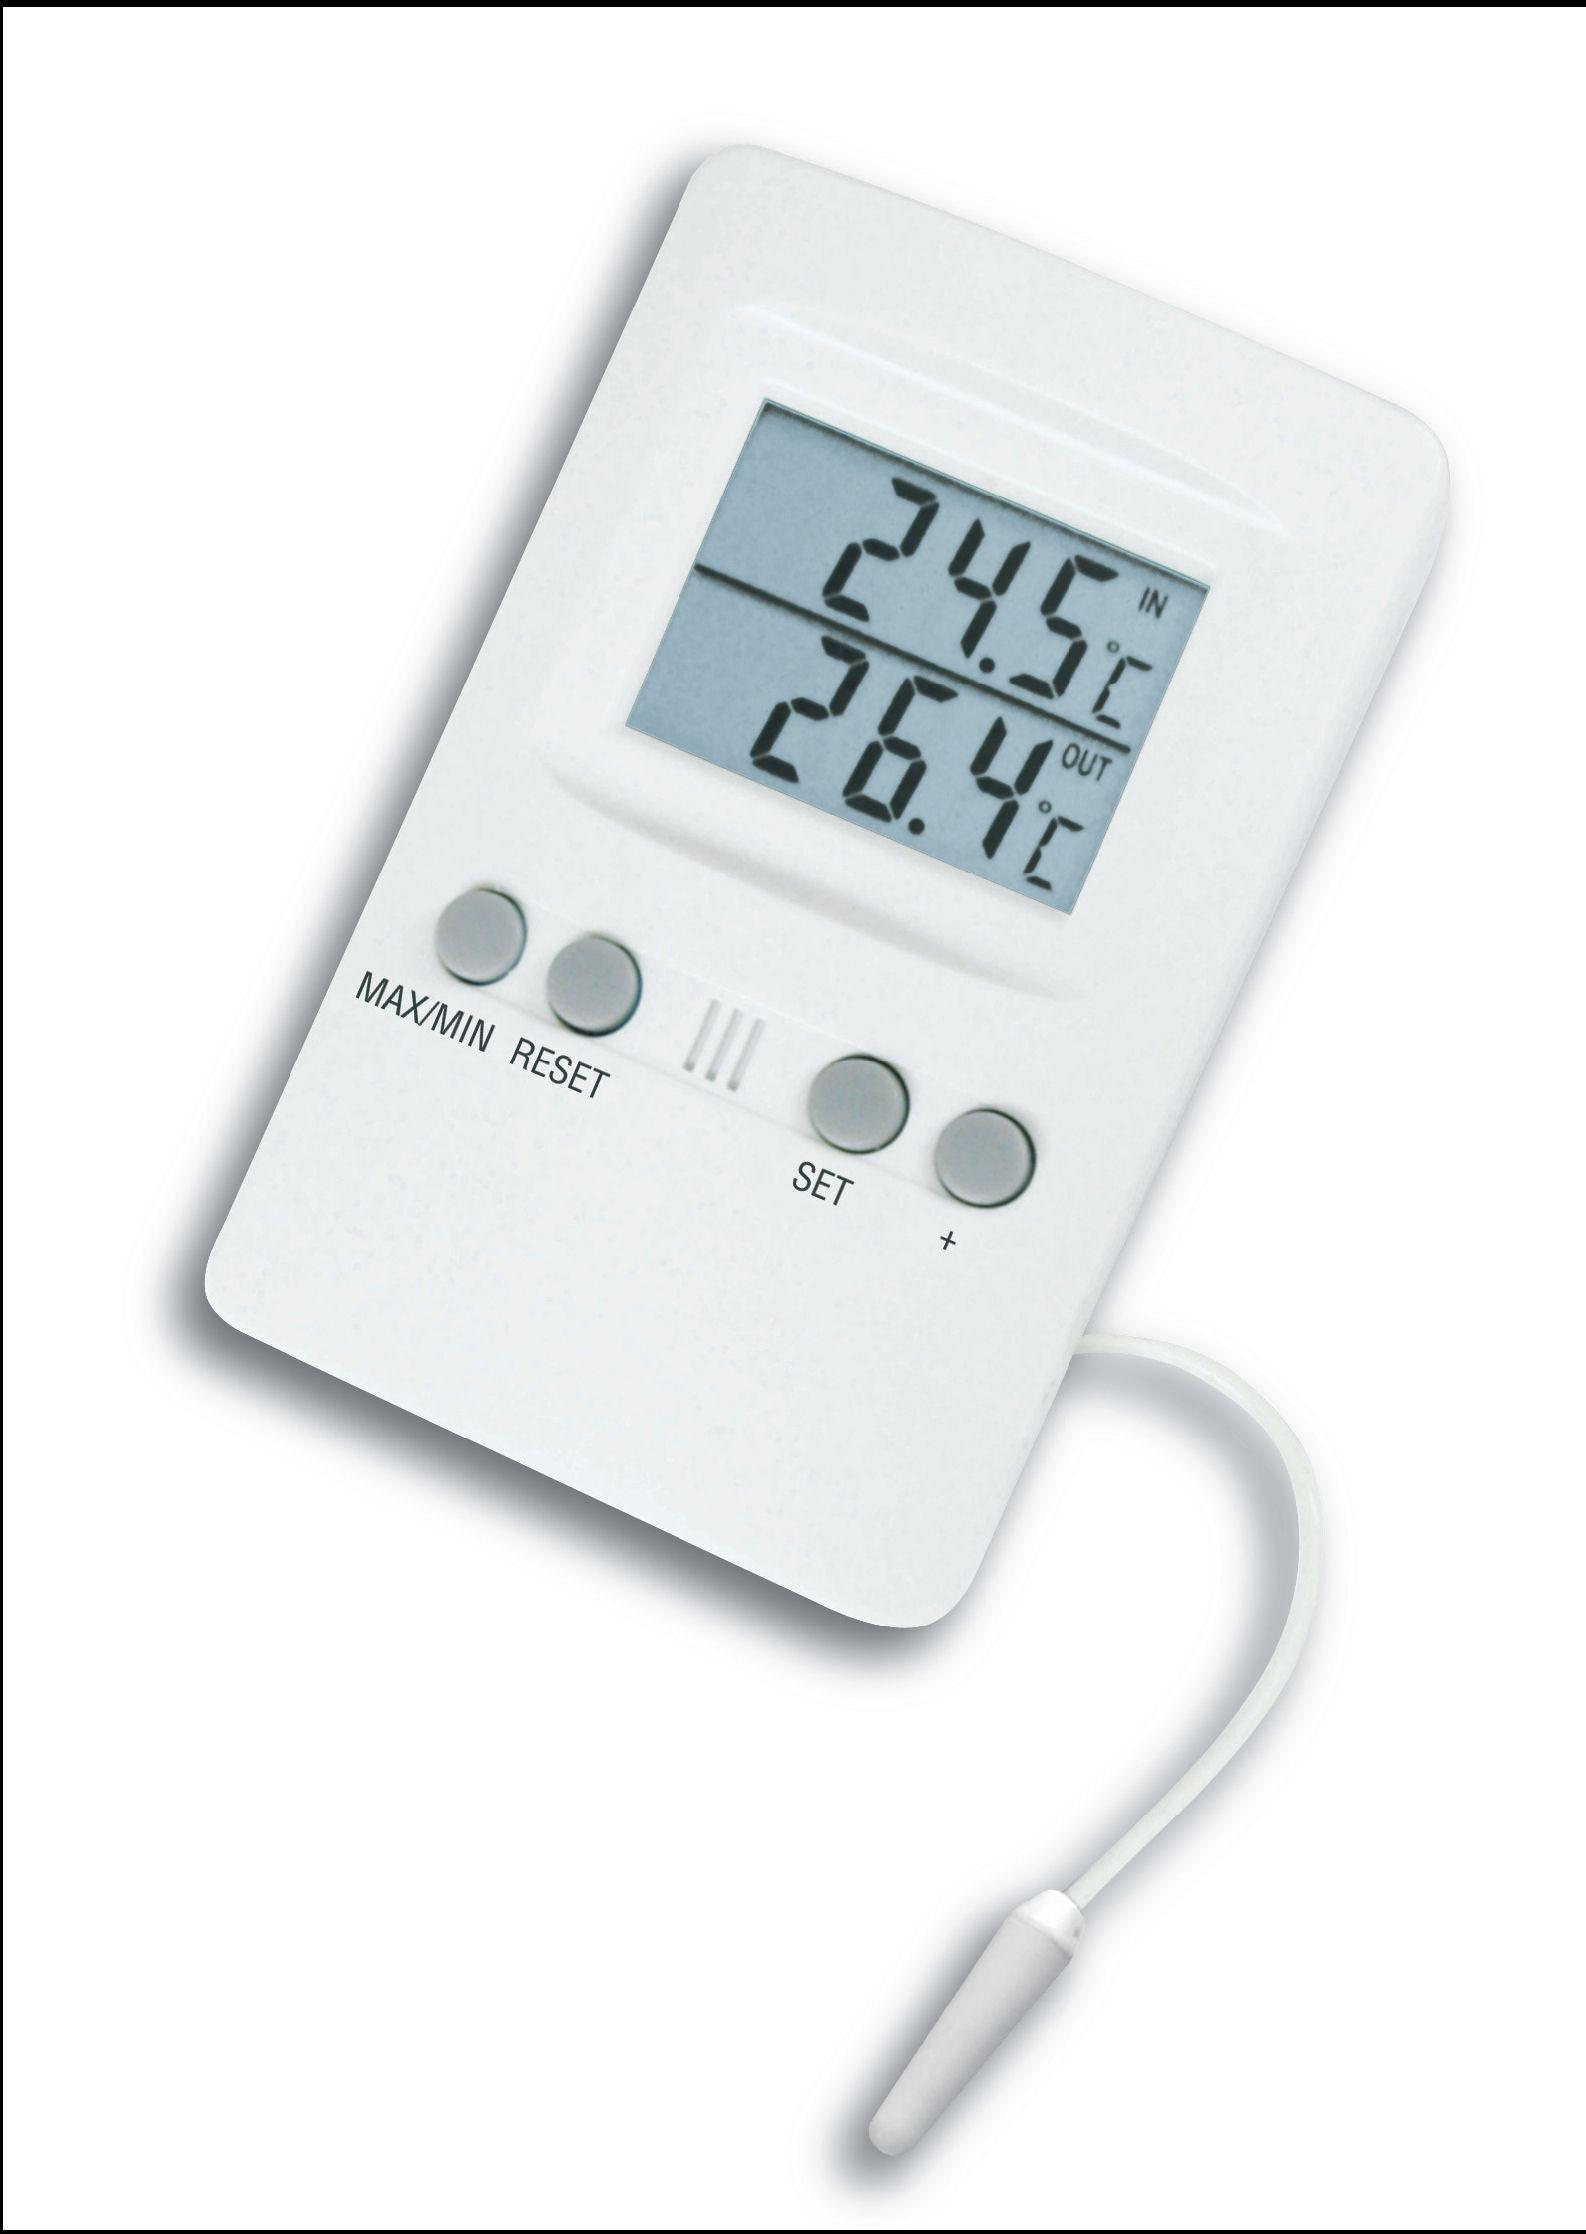 k hlschrank gefrierschrank thermometer 709 mit alarm. Black Bedroom Furniture Sets. Home Design Ideas